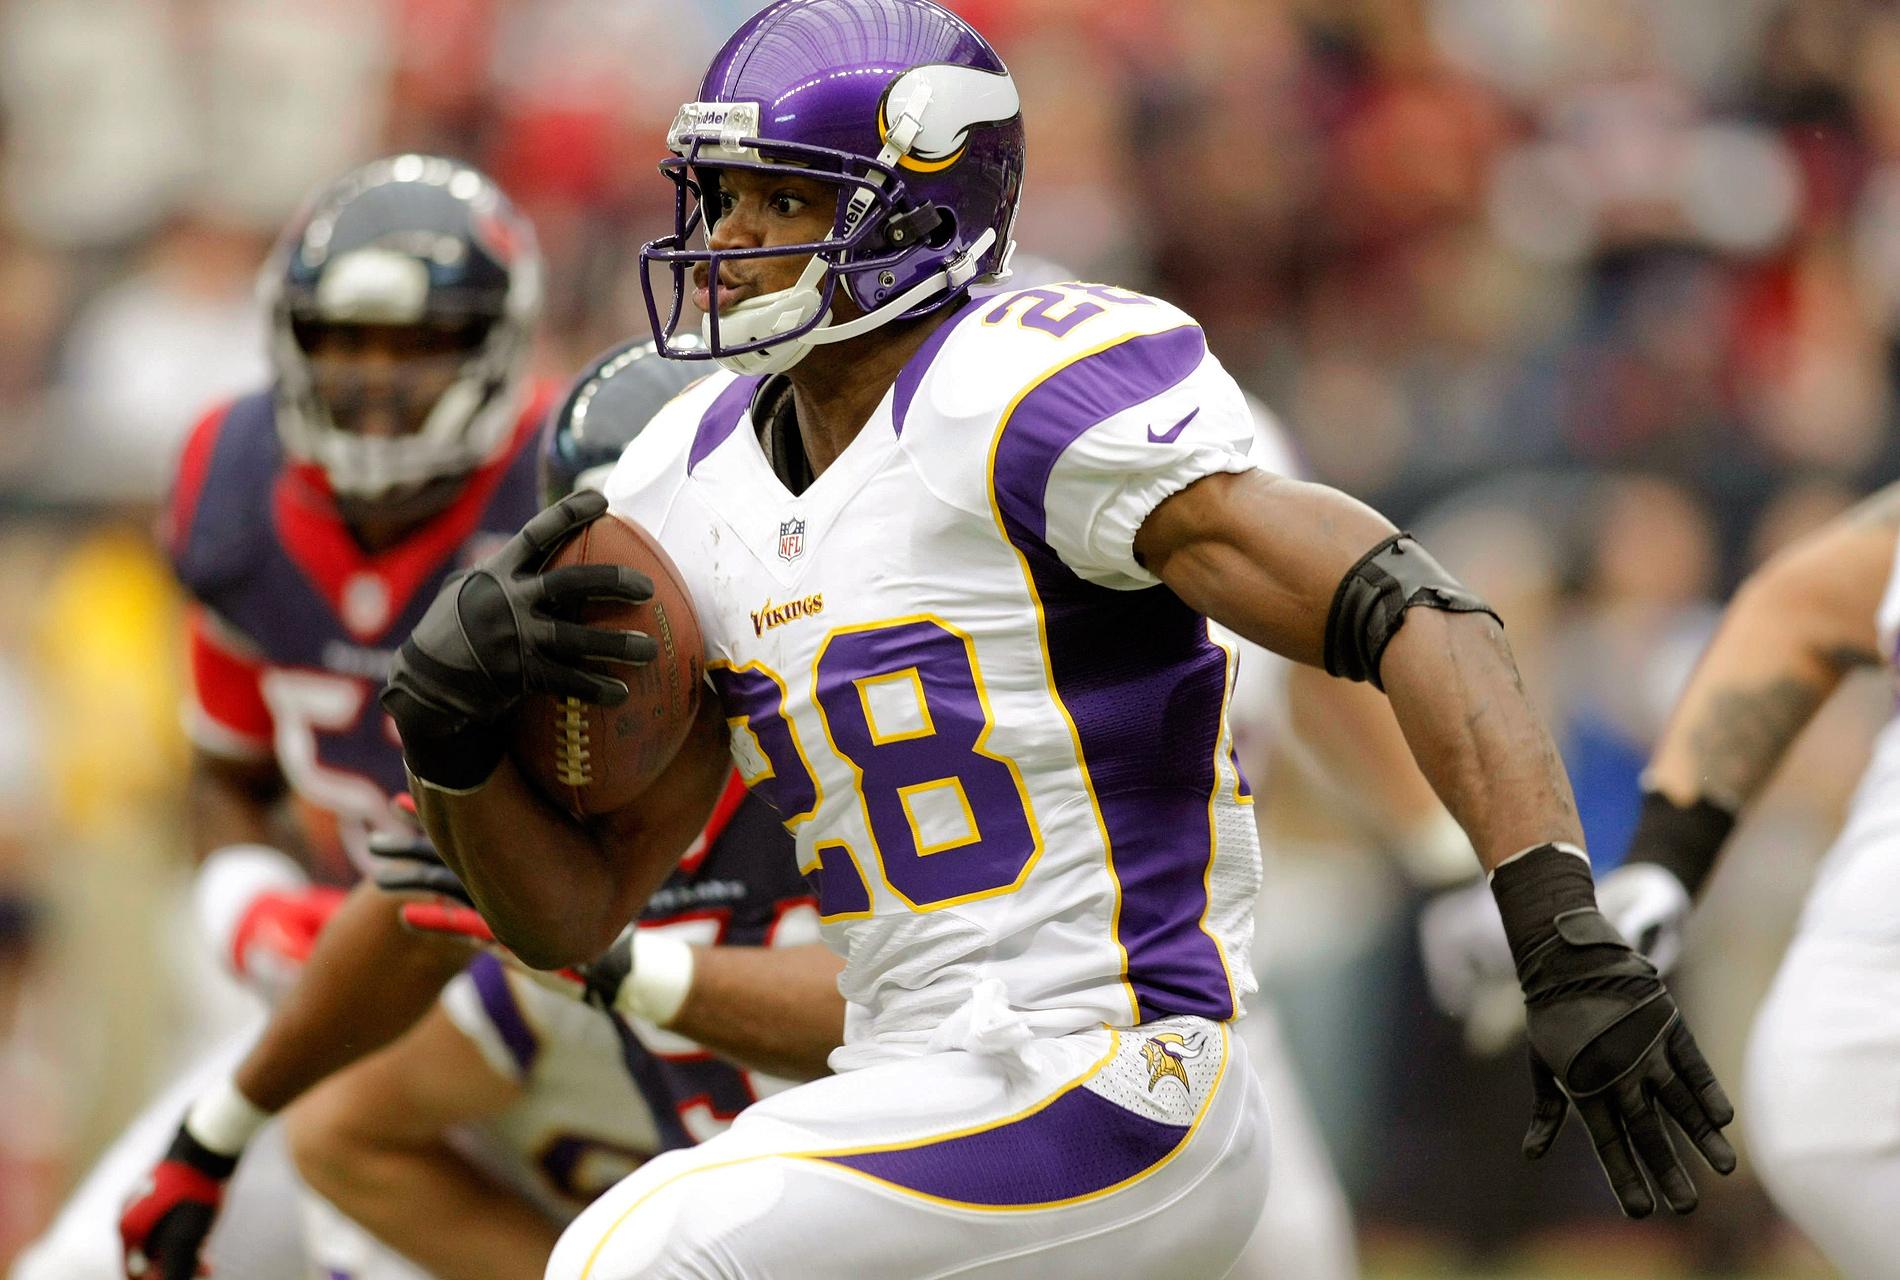 RUNNING BACK: Adrian Peterson, Minnesota Vikings - John